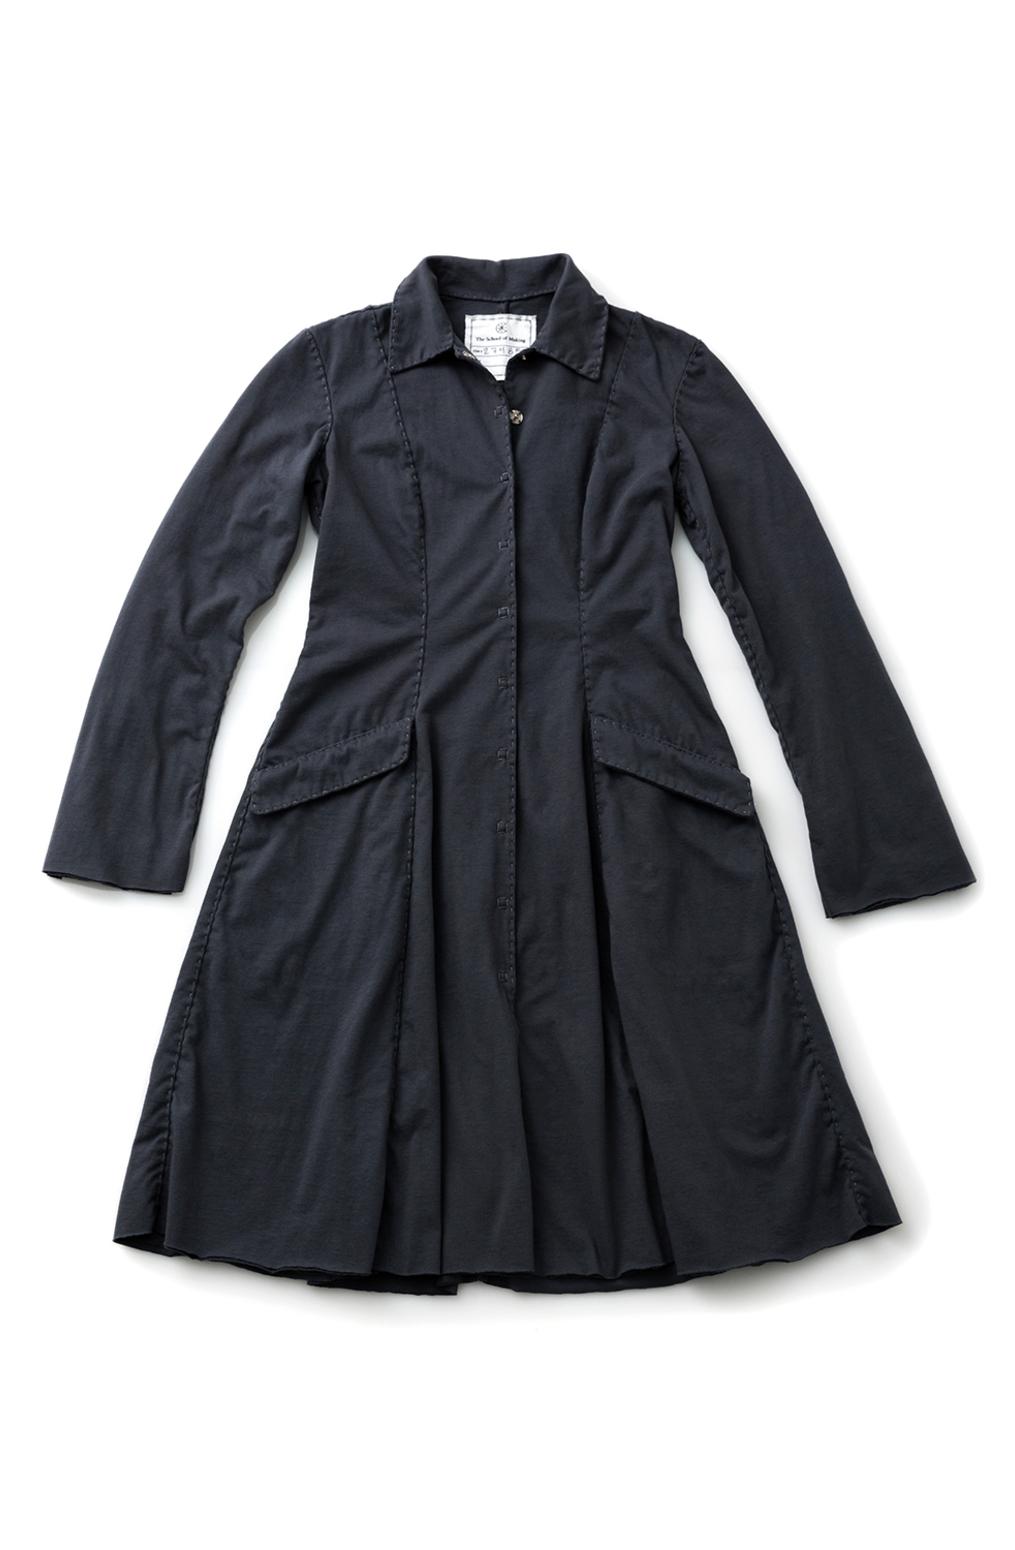 The school of making ezra coat pattern 1